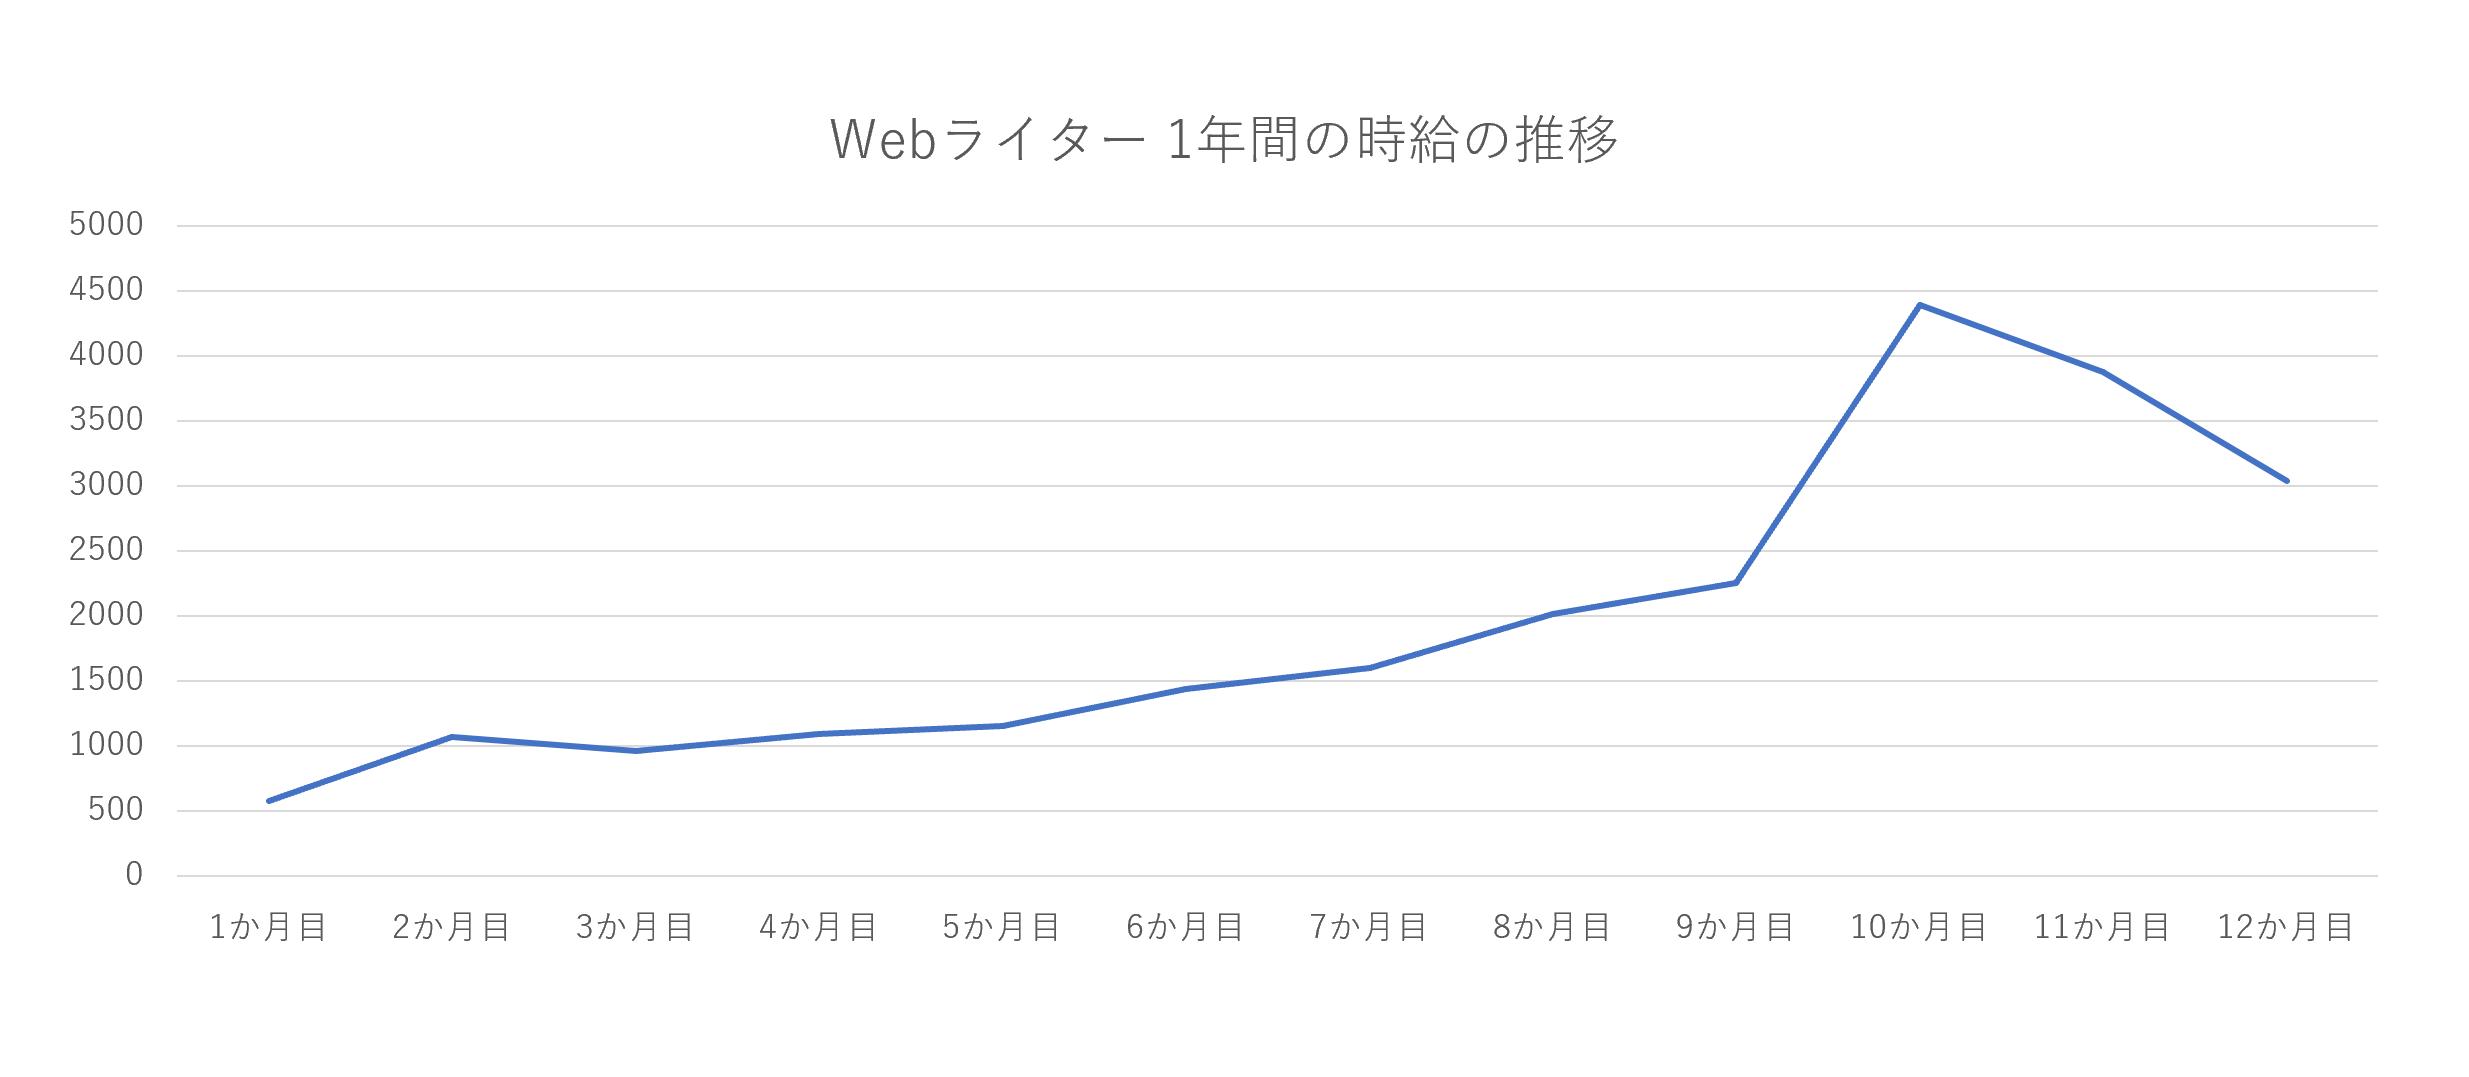 Webライターの時給の推移【実例】